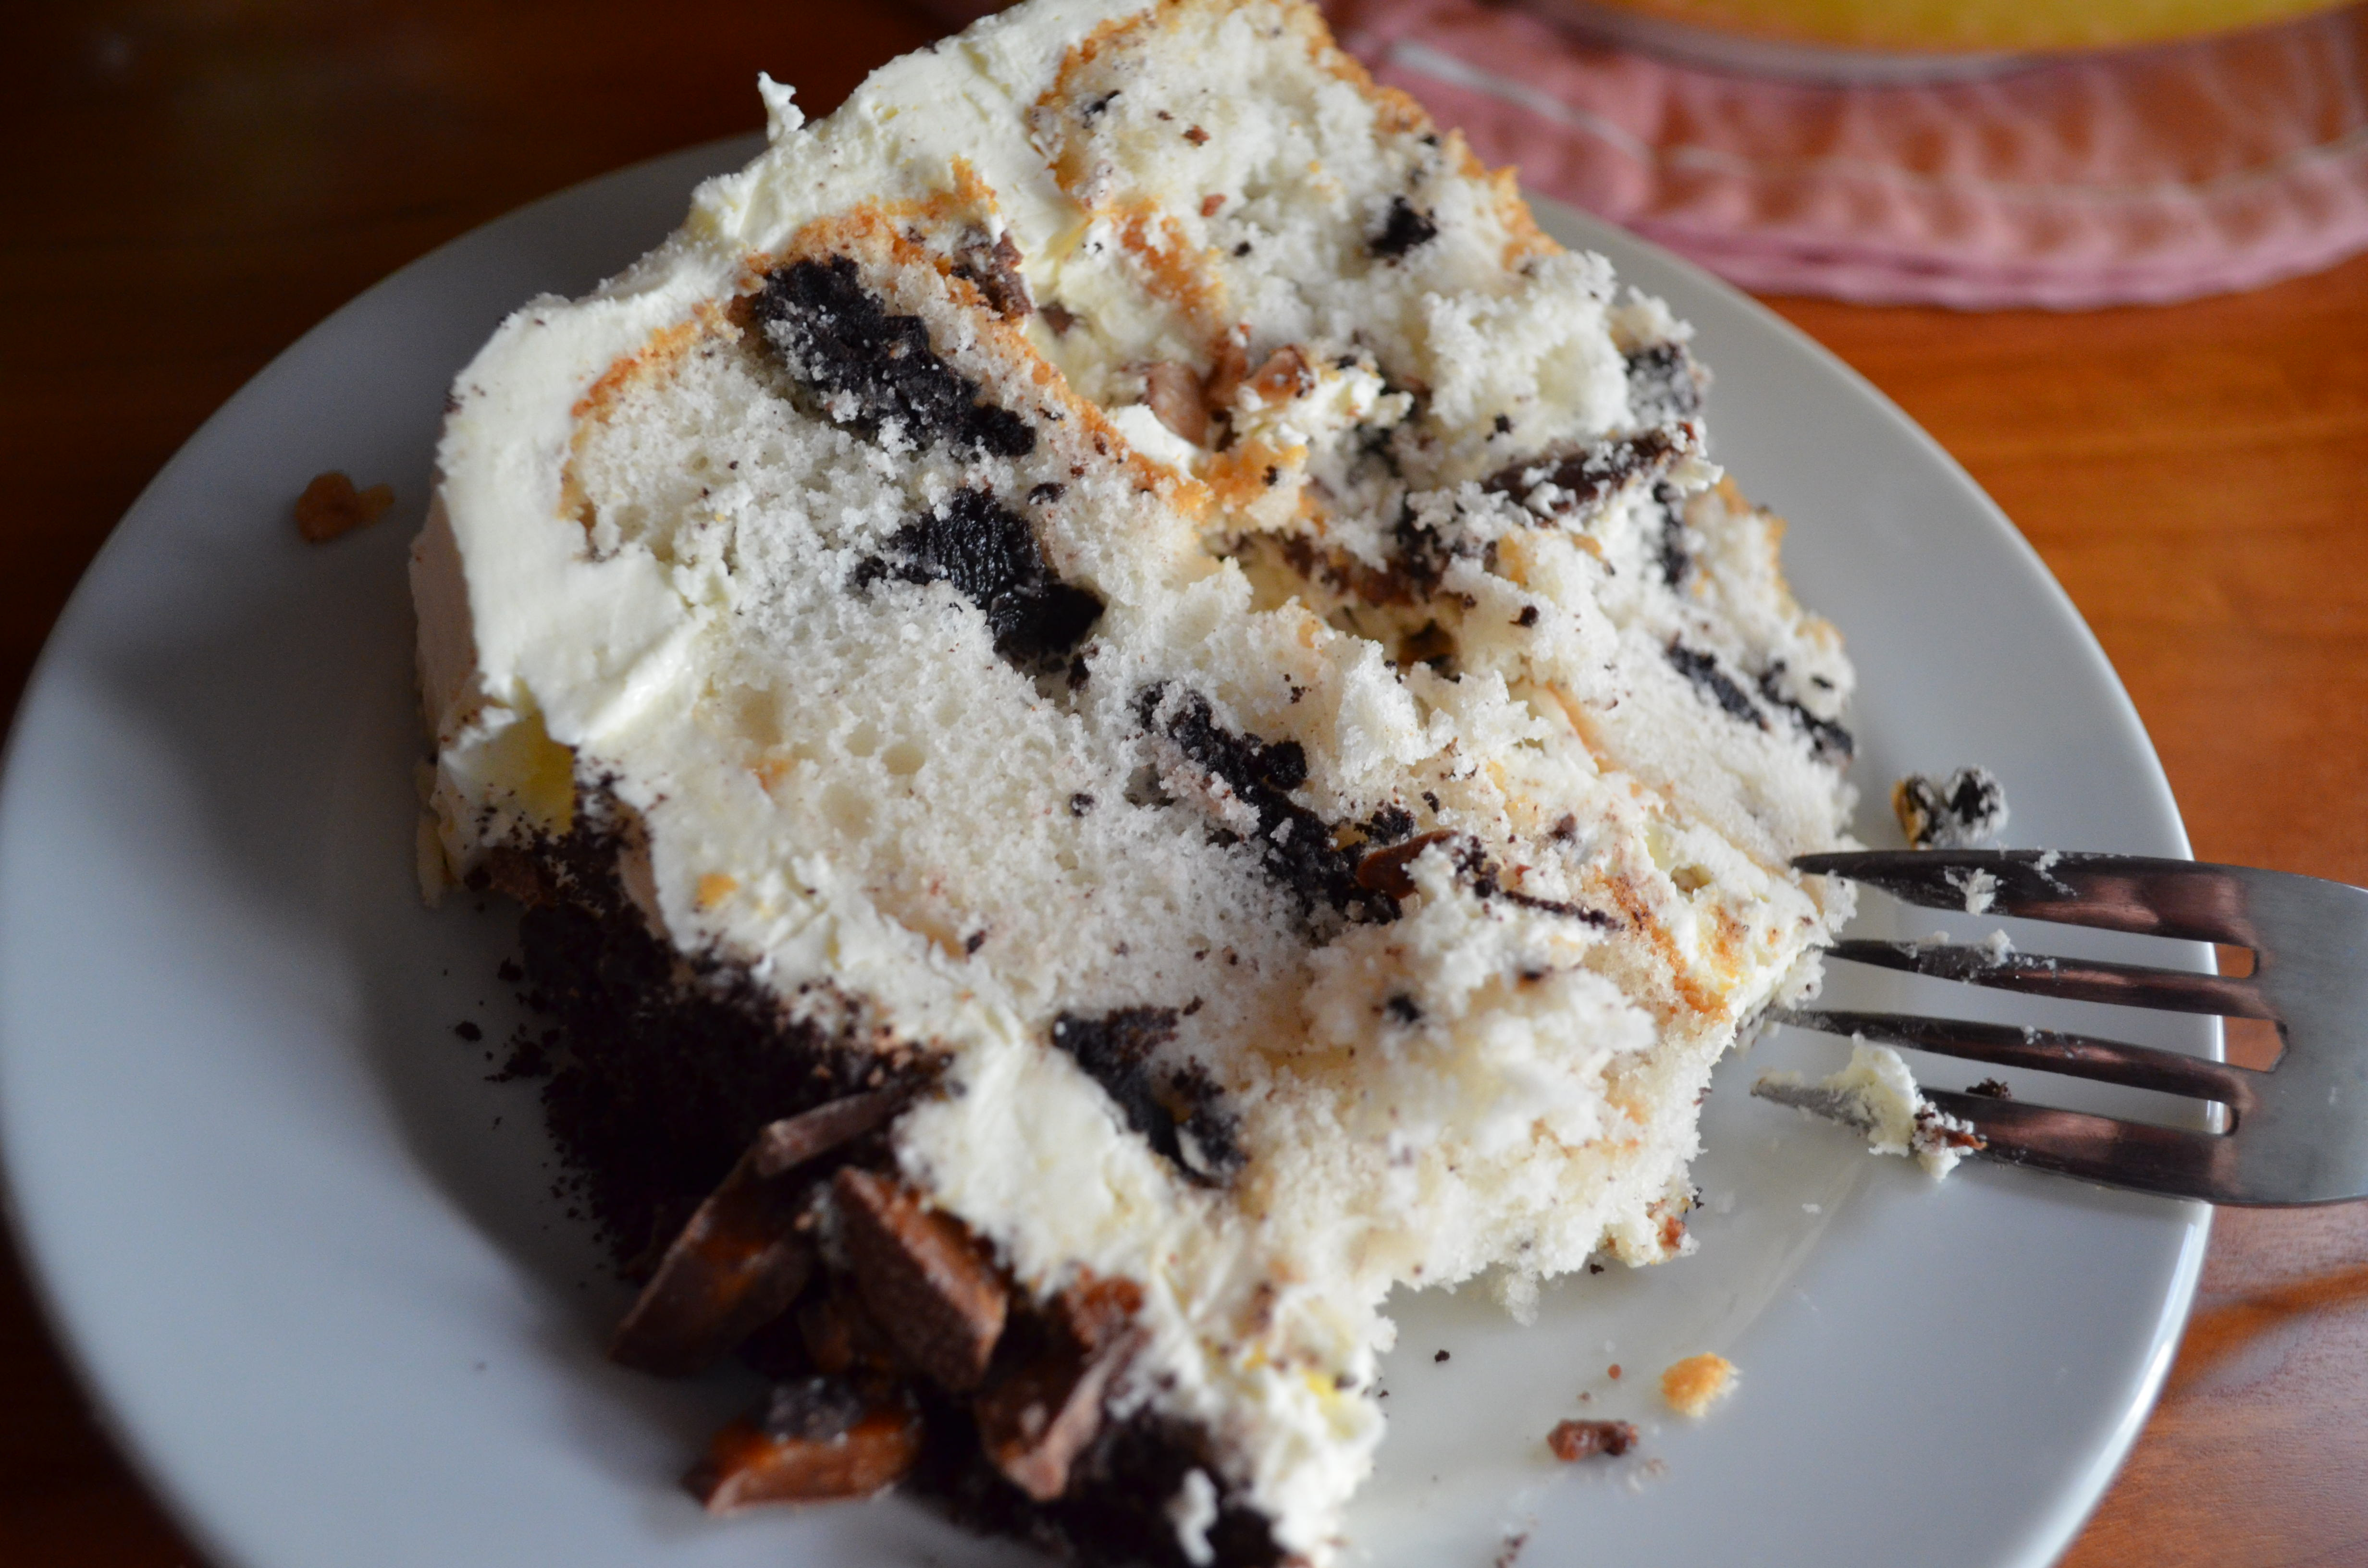 Oreo Heath Bar Blizzard Cake I Sing In The Kitchen